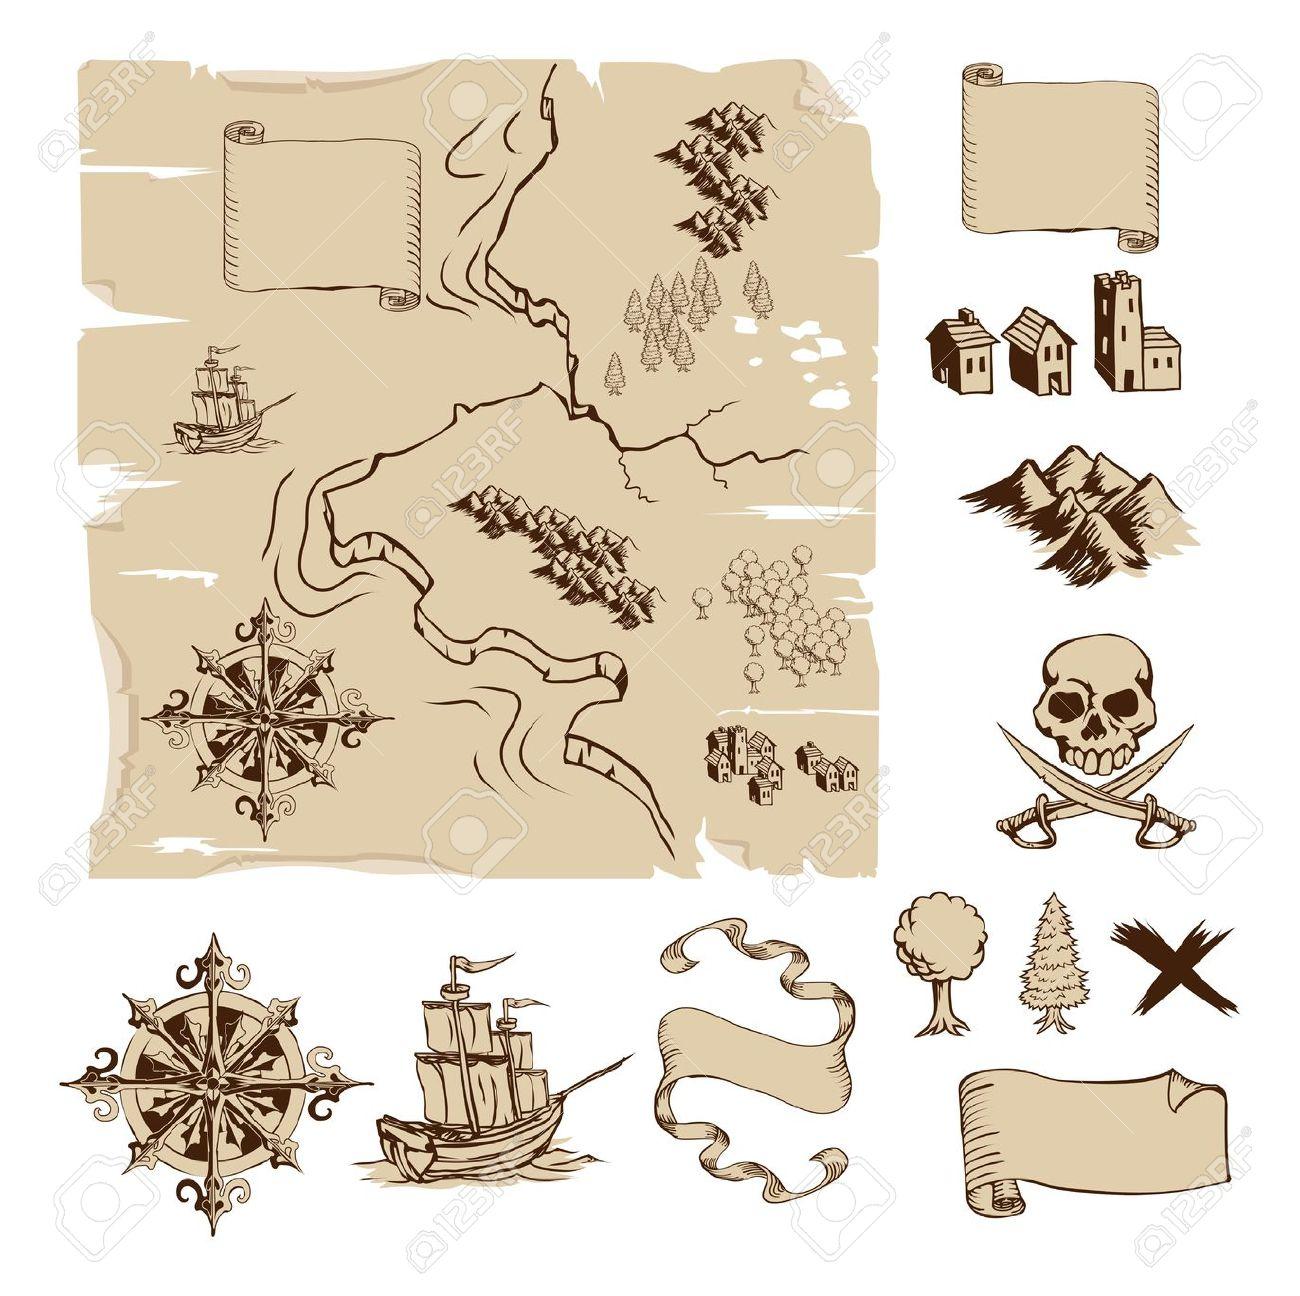 570 Treasure Map free clipart.